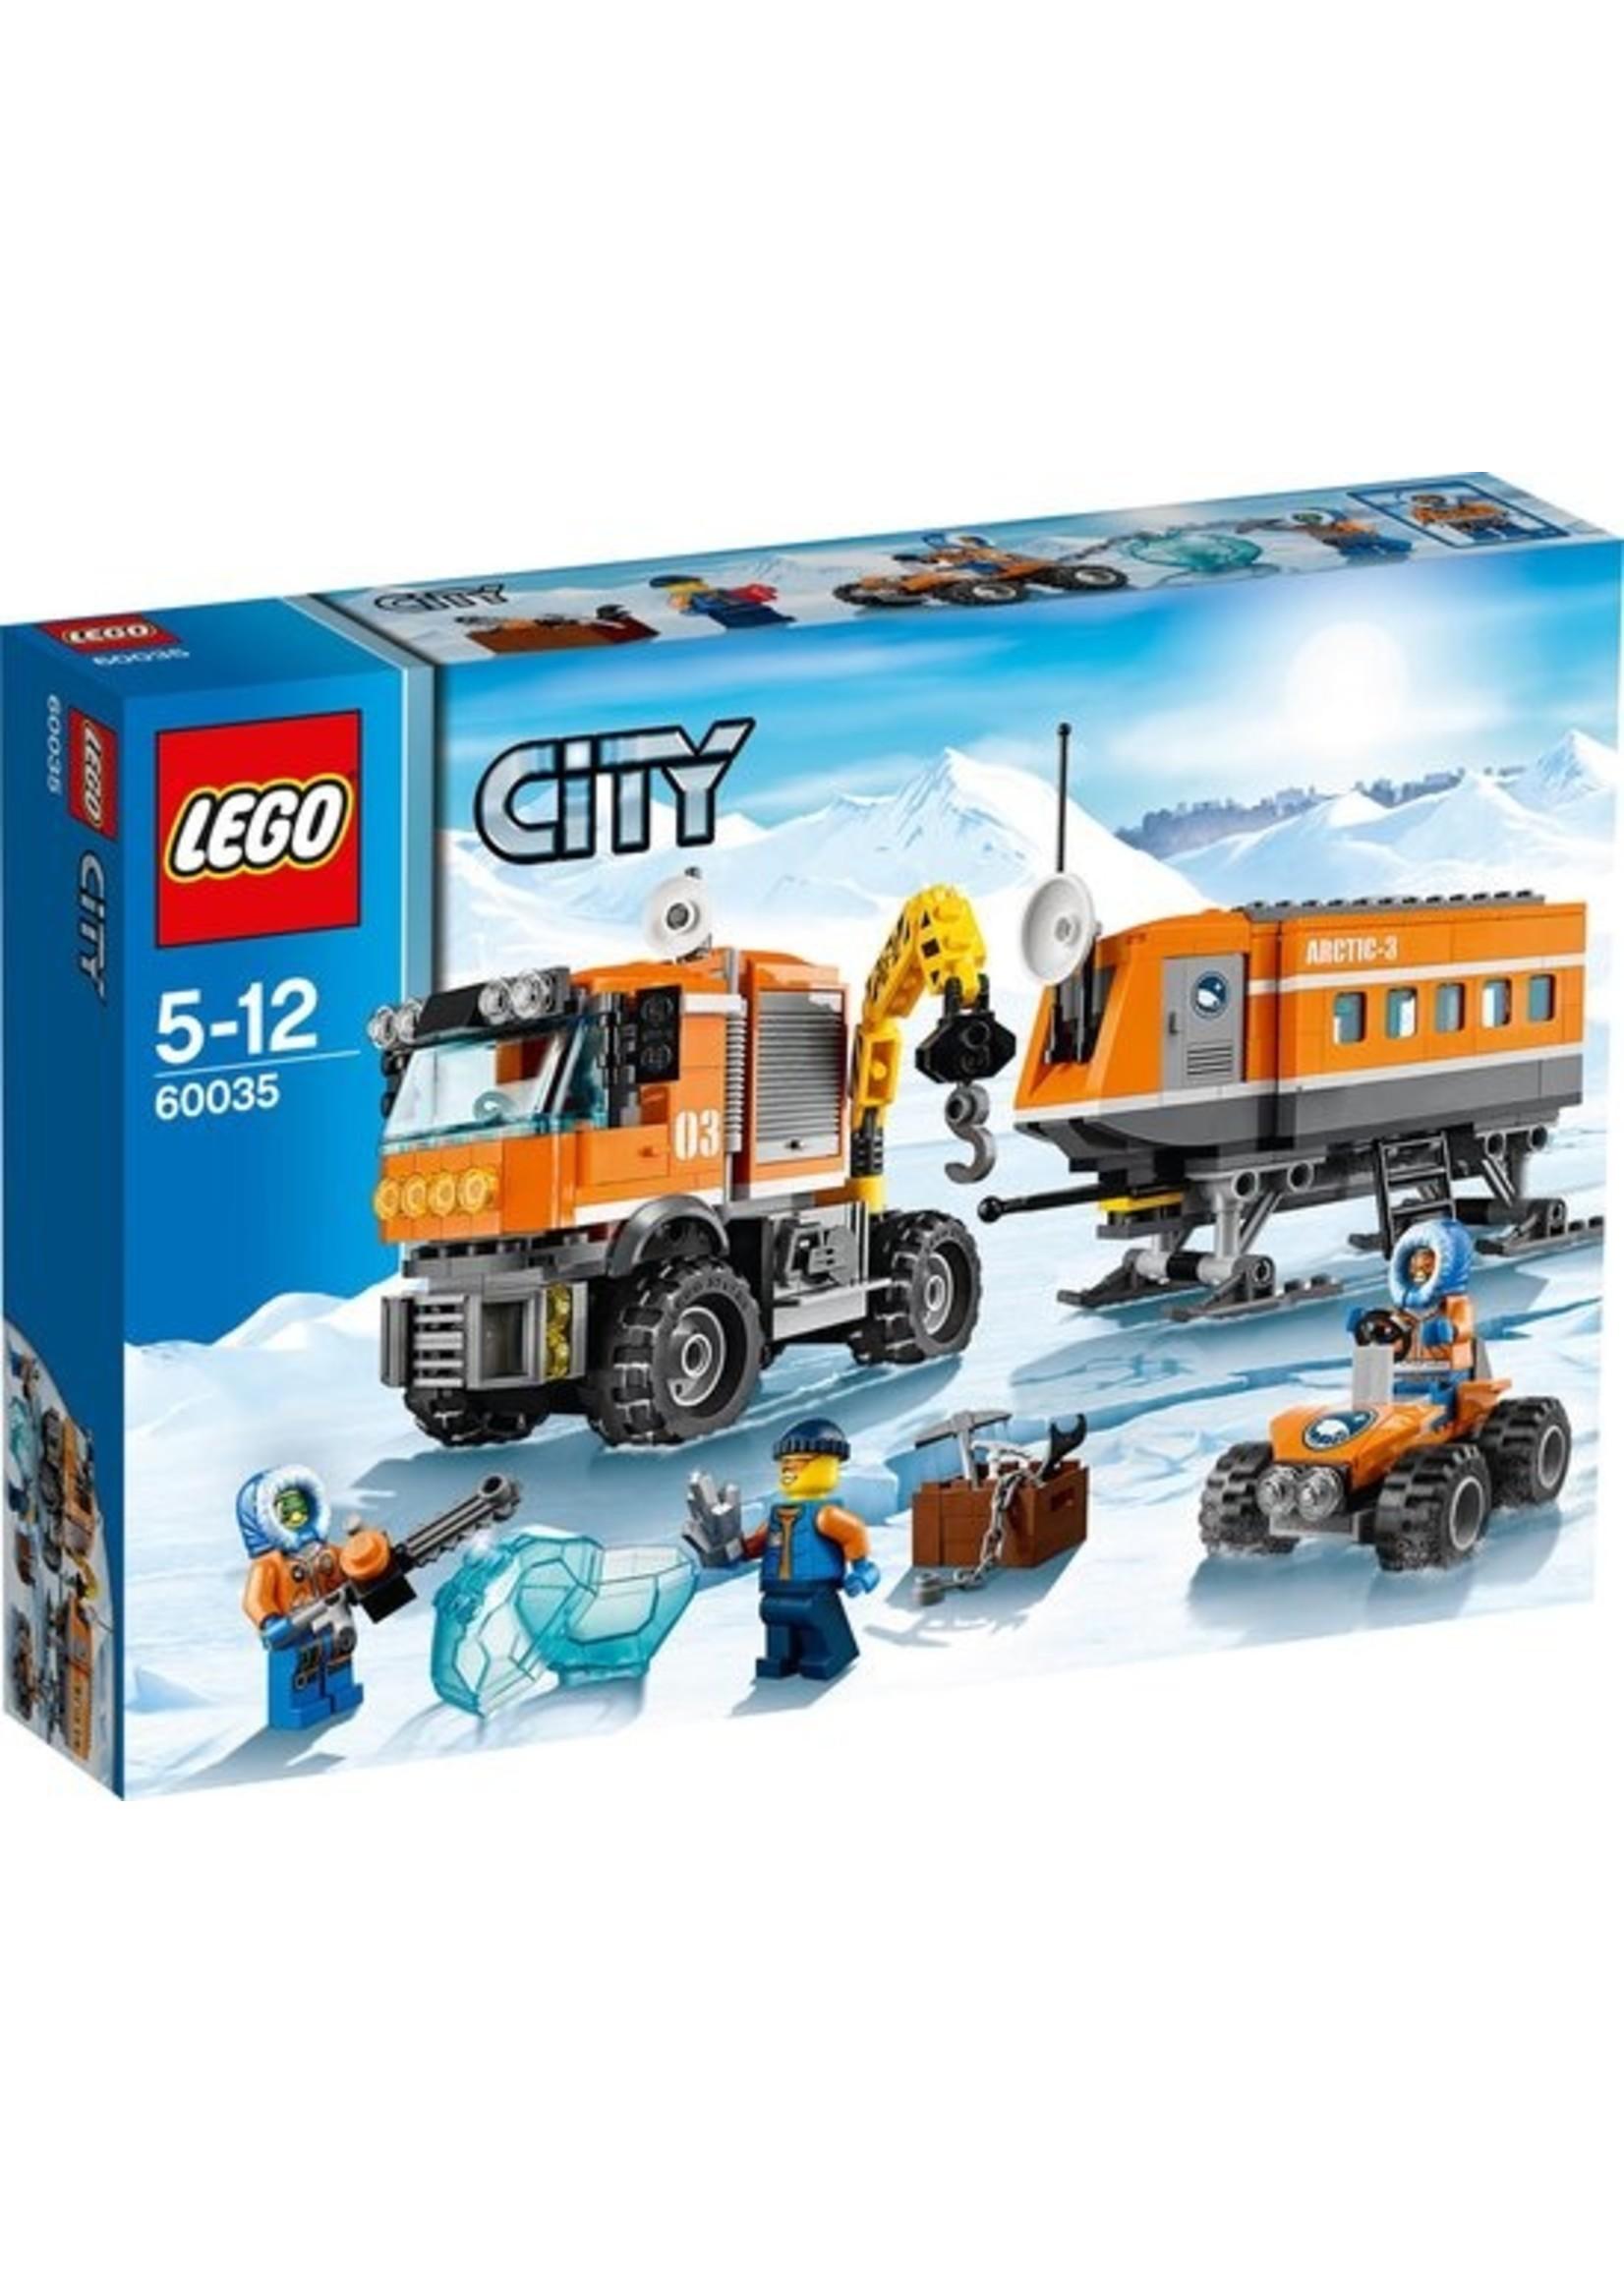 LEGO City Arctic Voorpost 60035